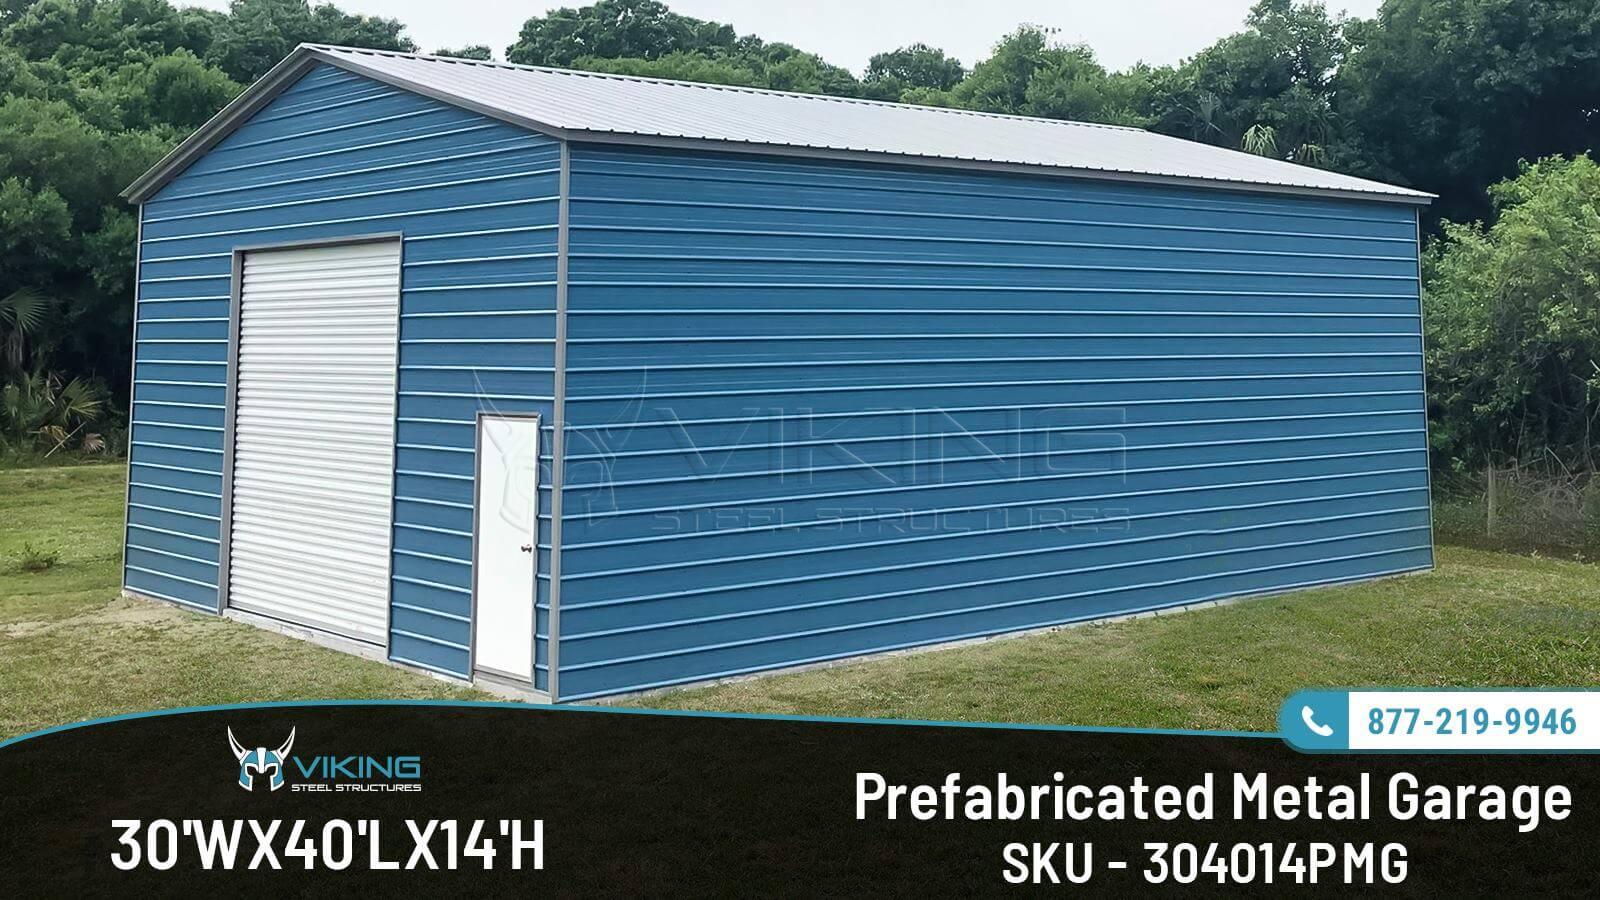 prefabricated metal garage